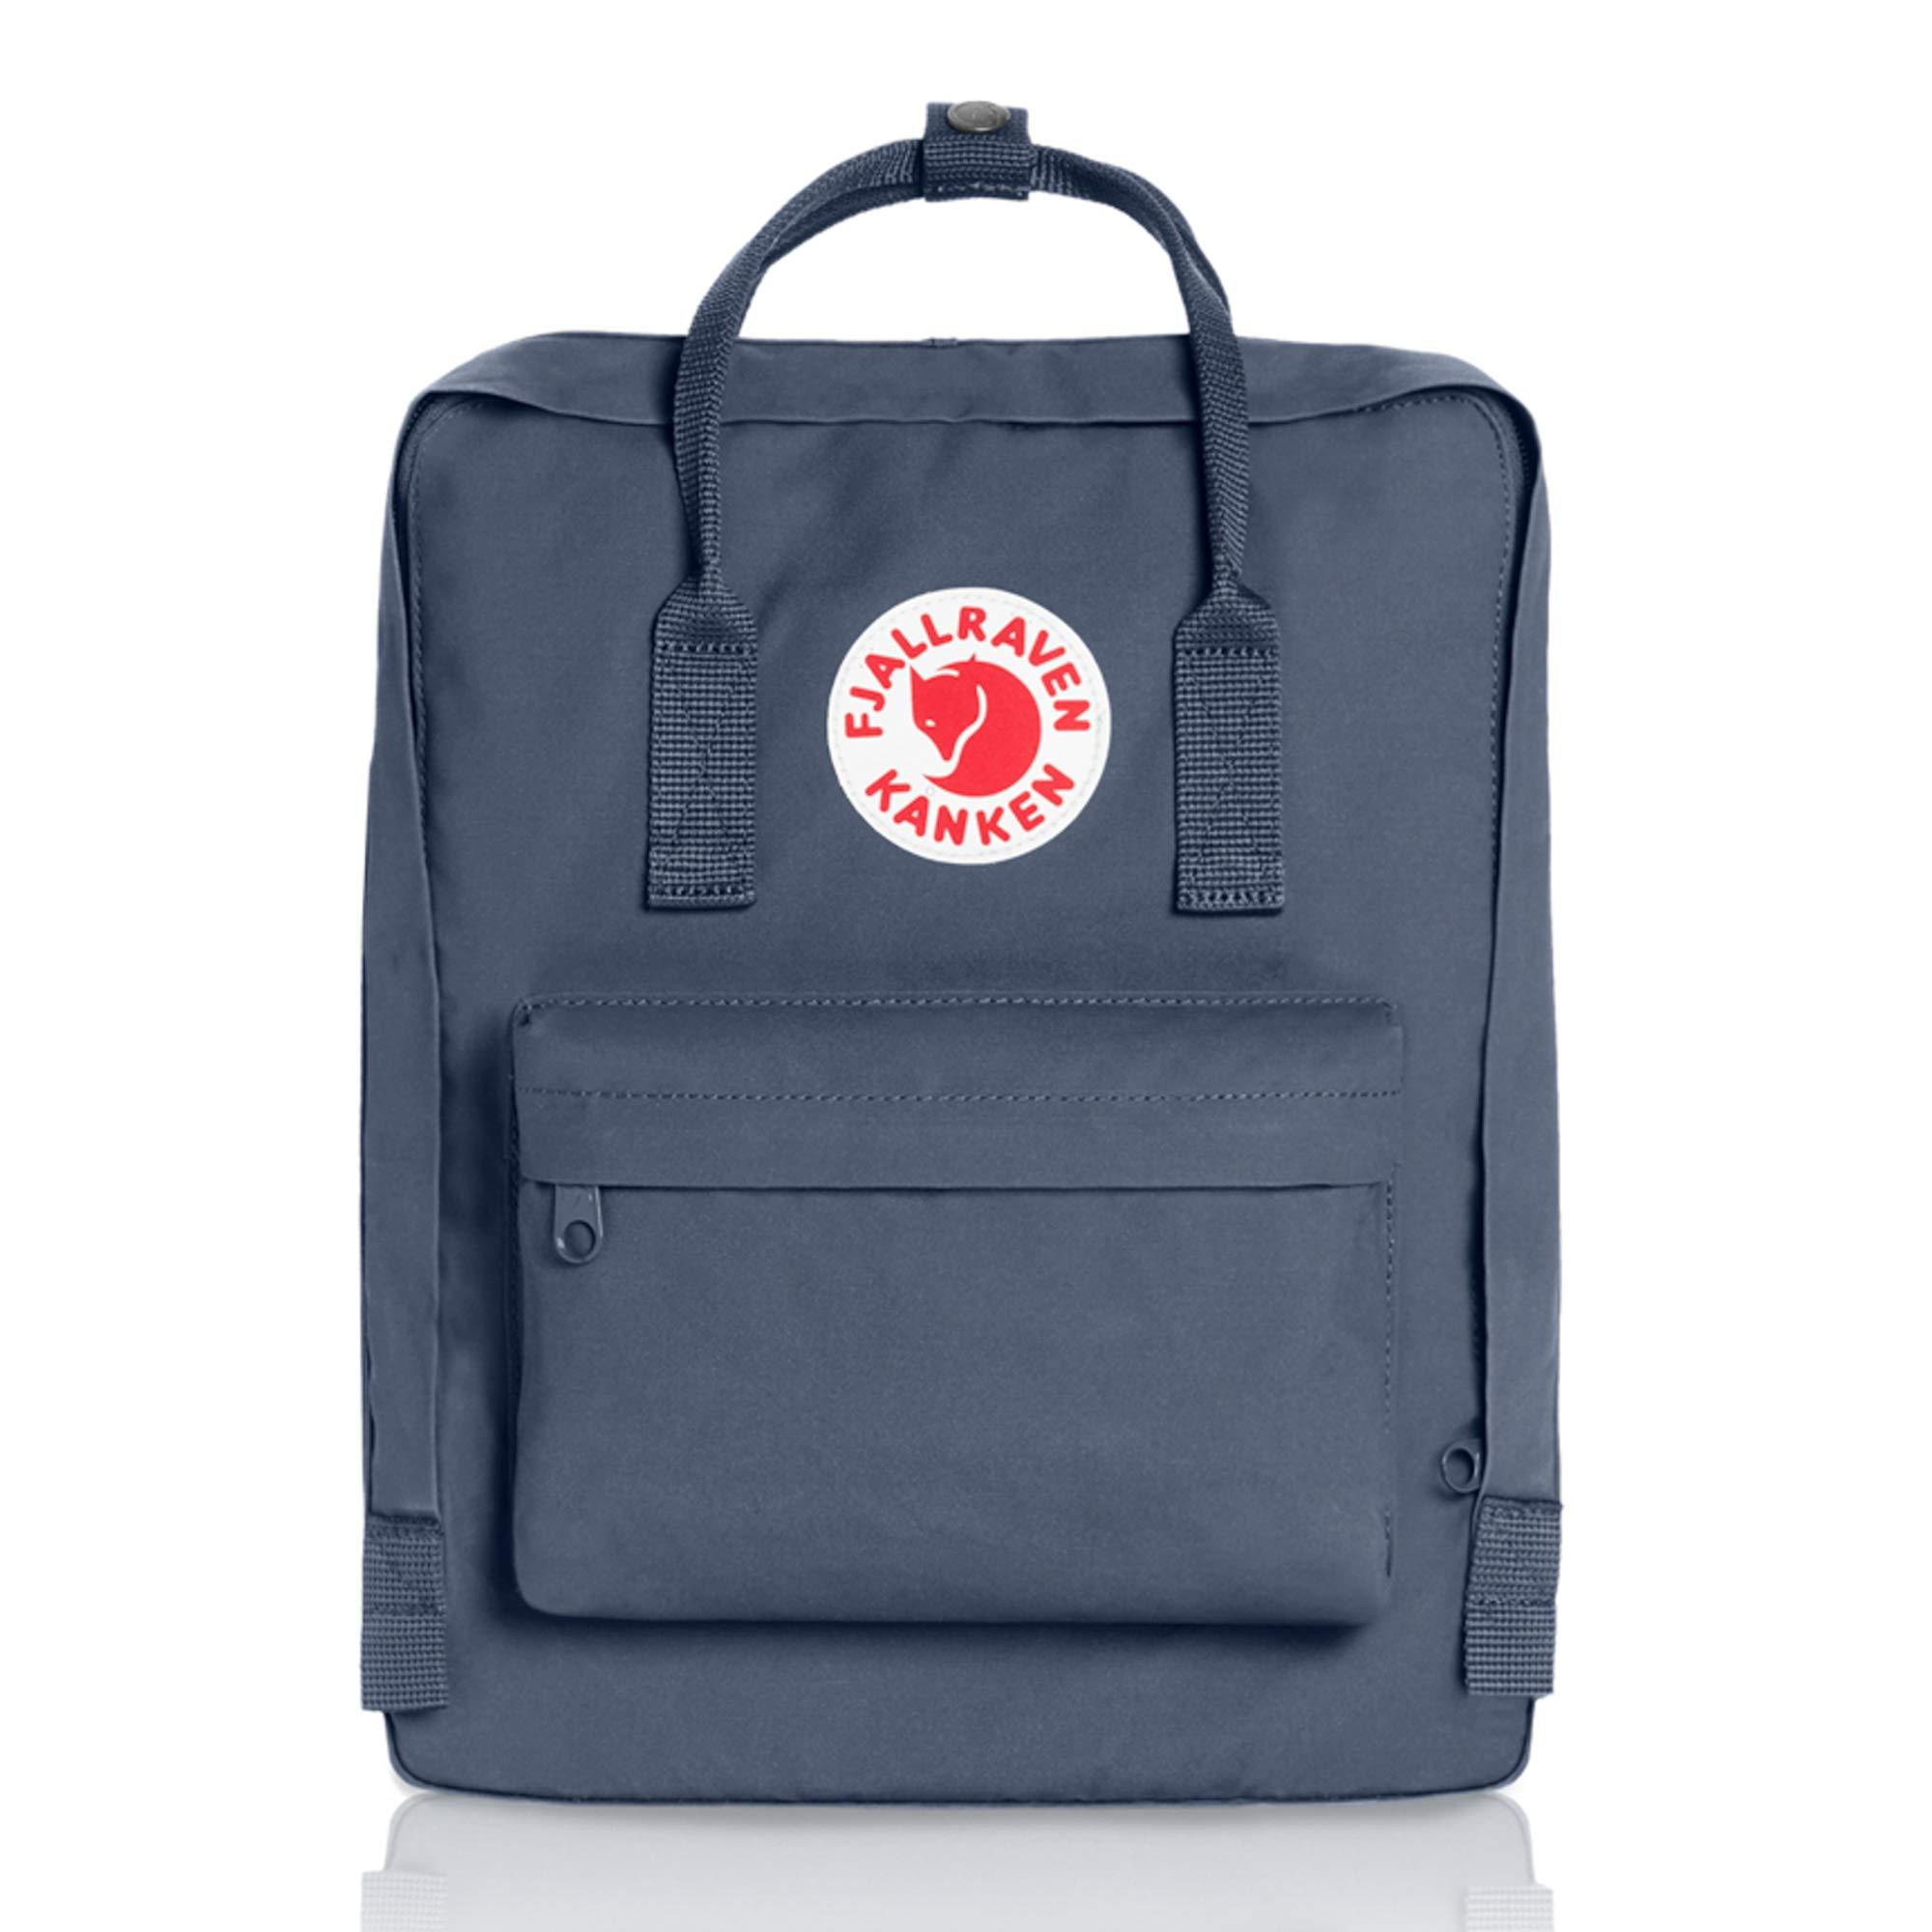 Fjallraven - Kanken Classic Backpack for Everyday, Graphite by Fjallraven